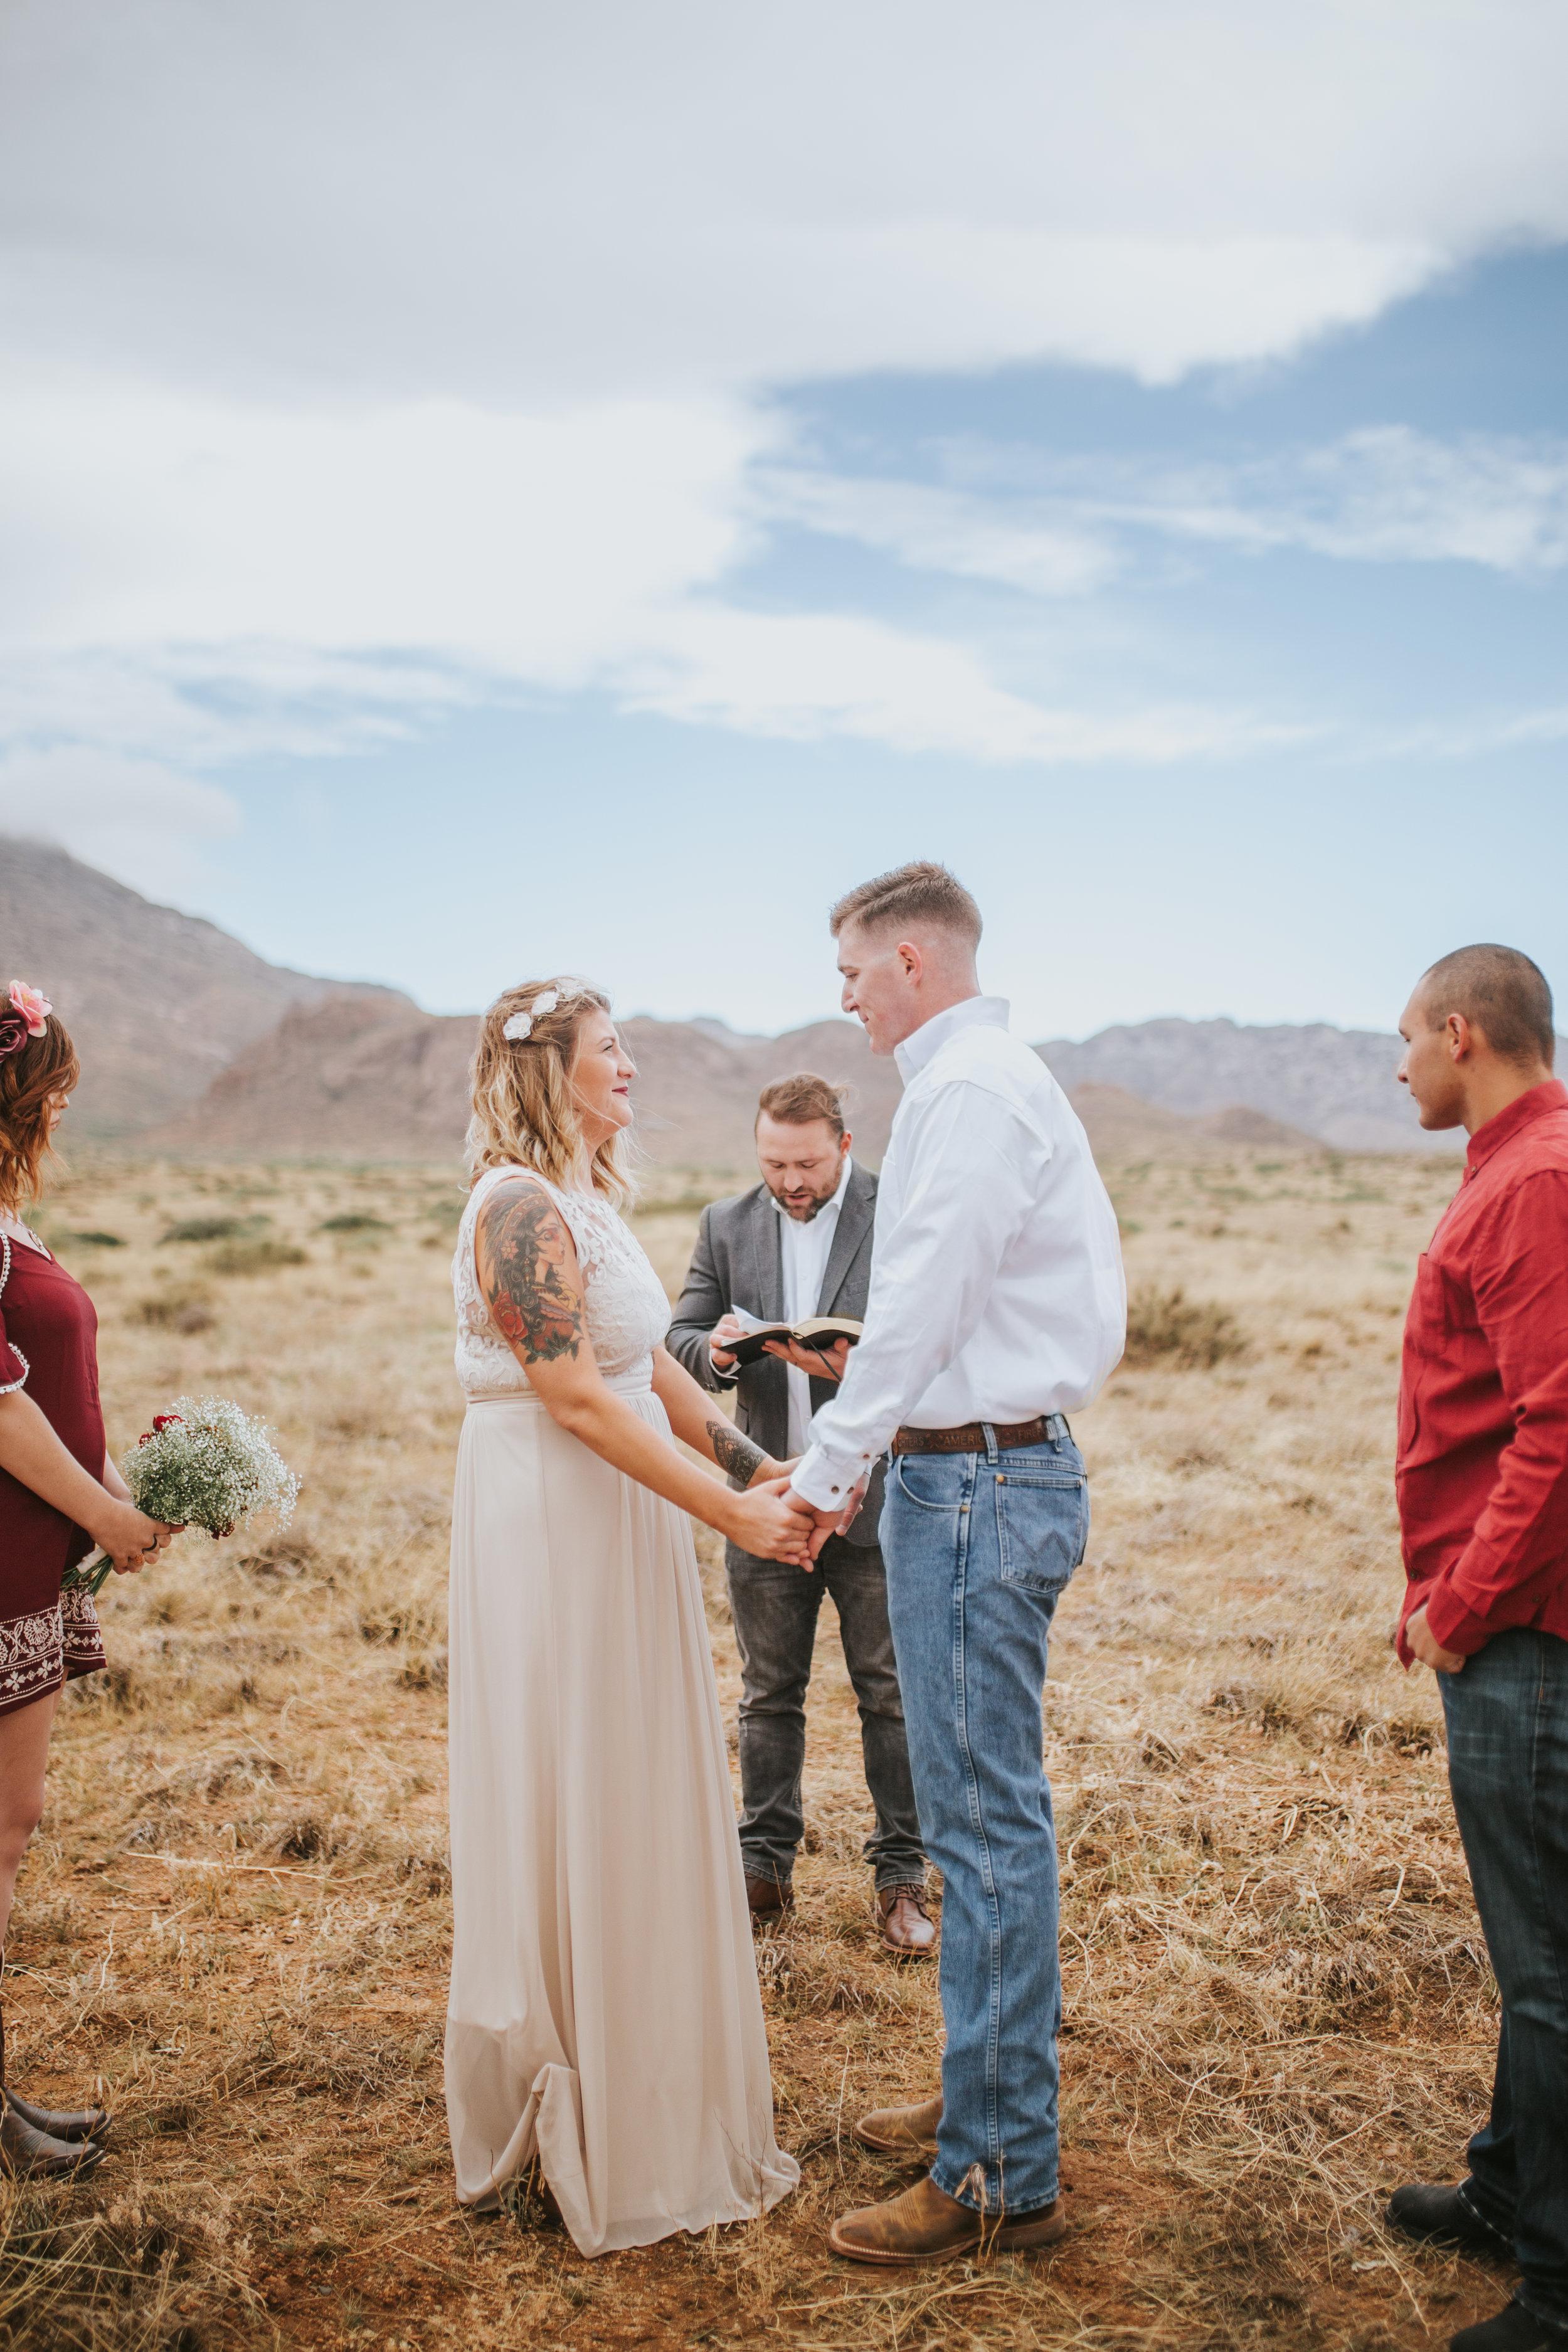 el-paso-texas-wedding-photographer-12